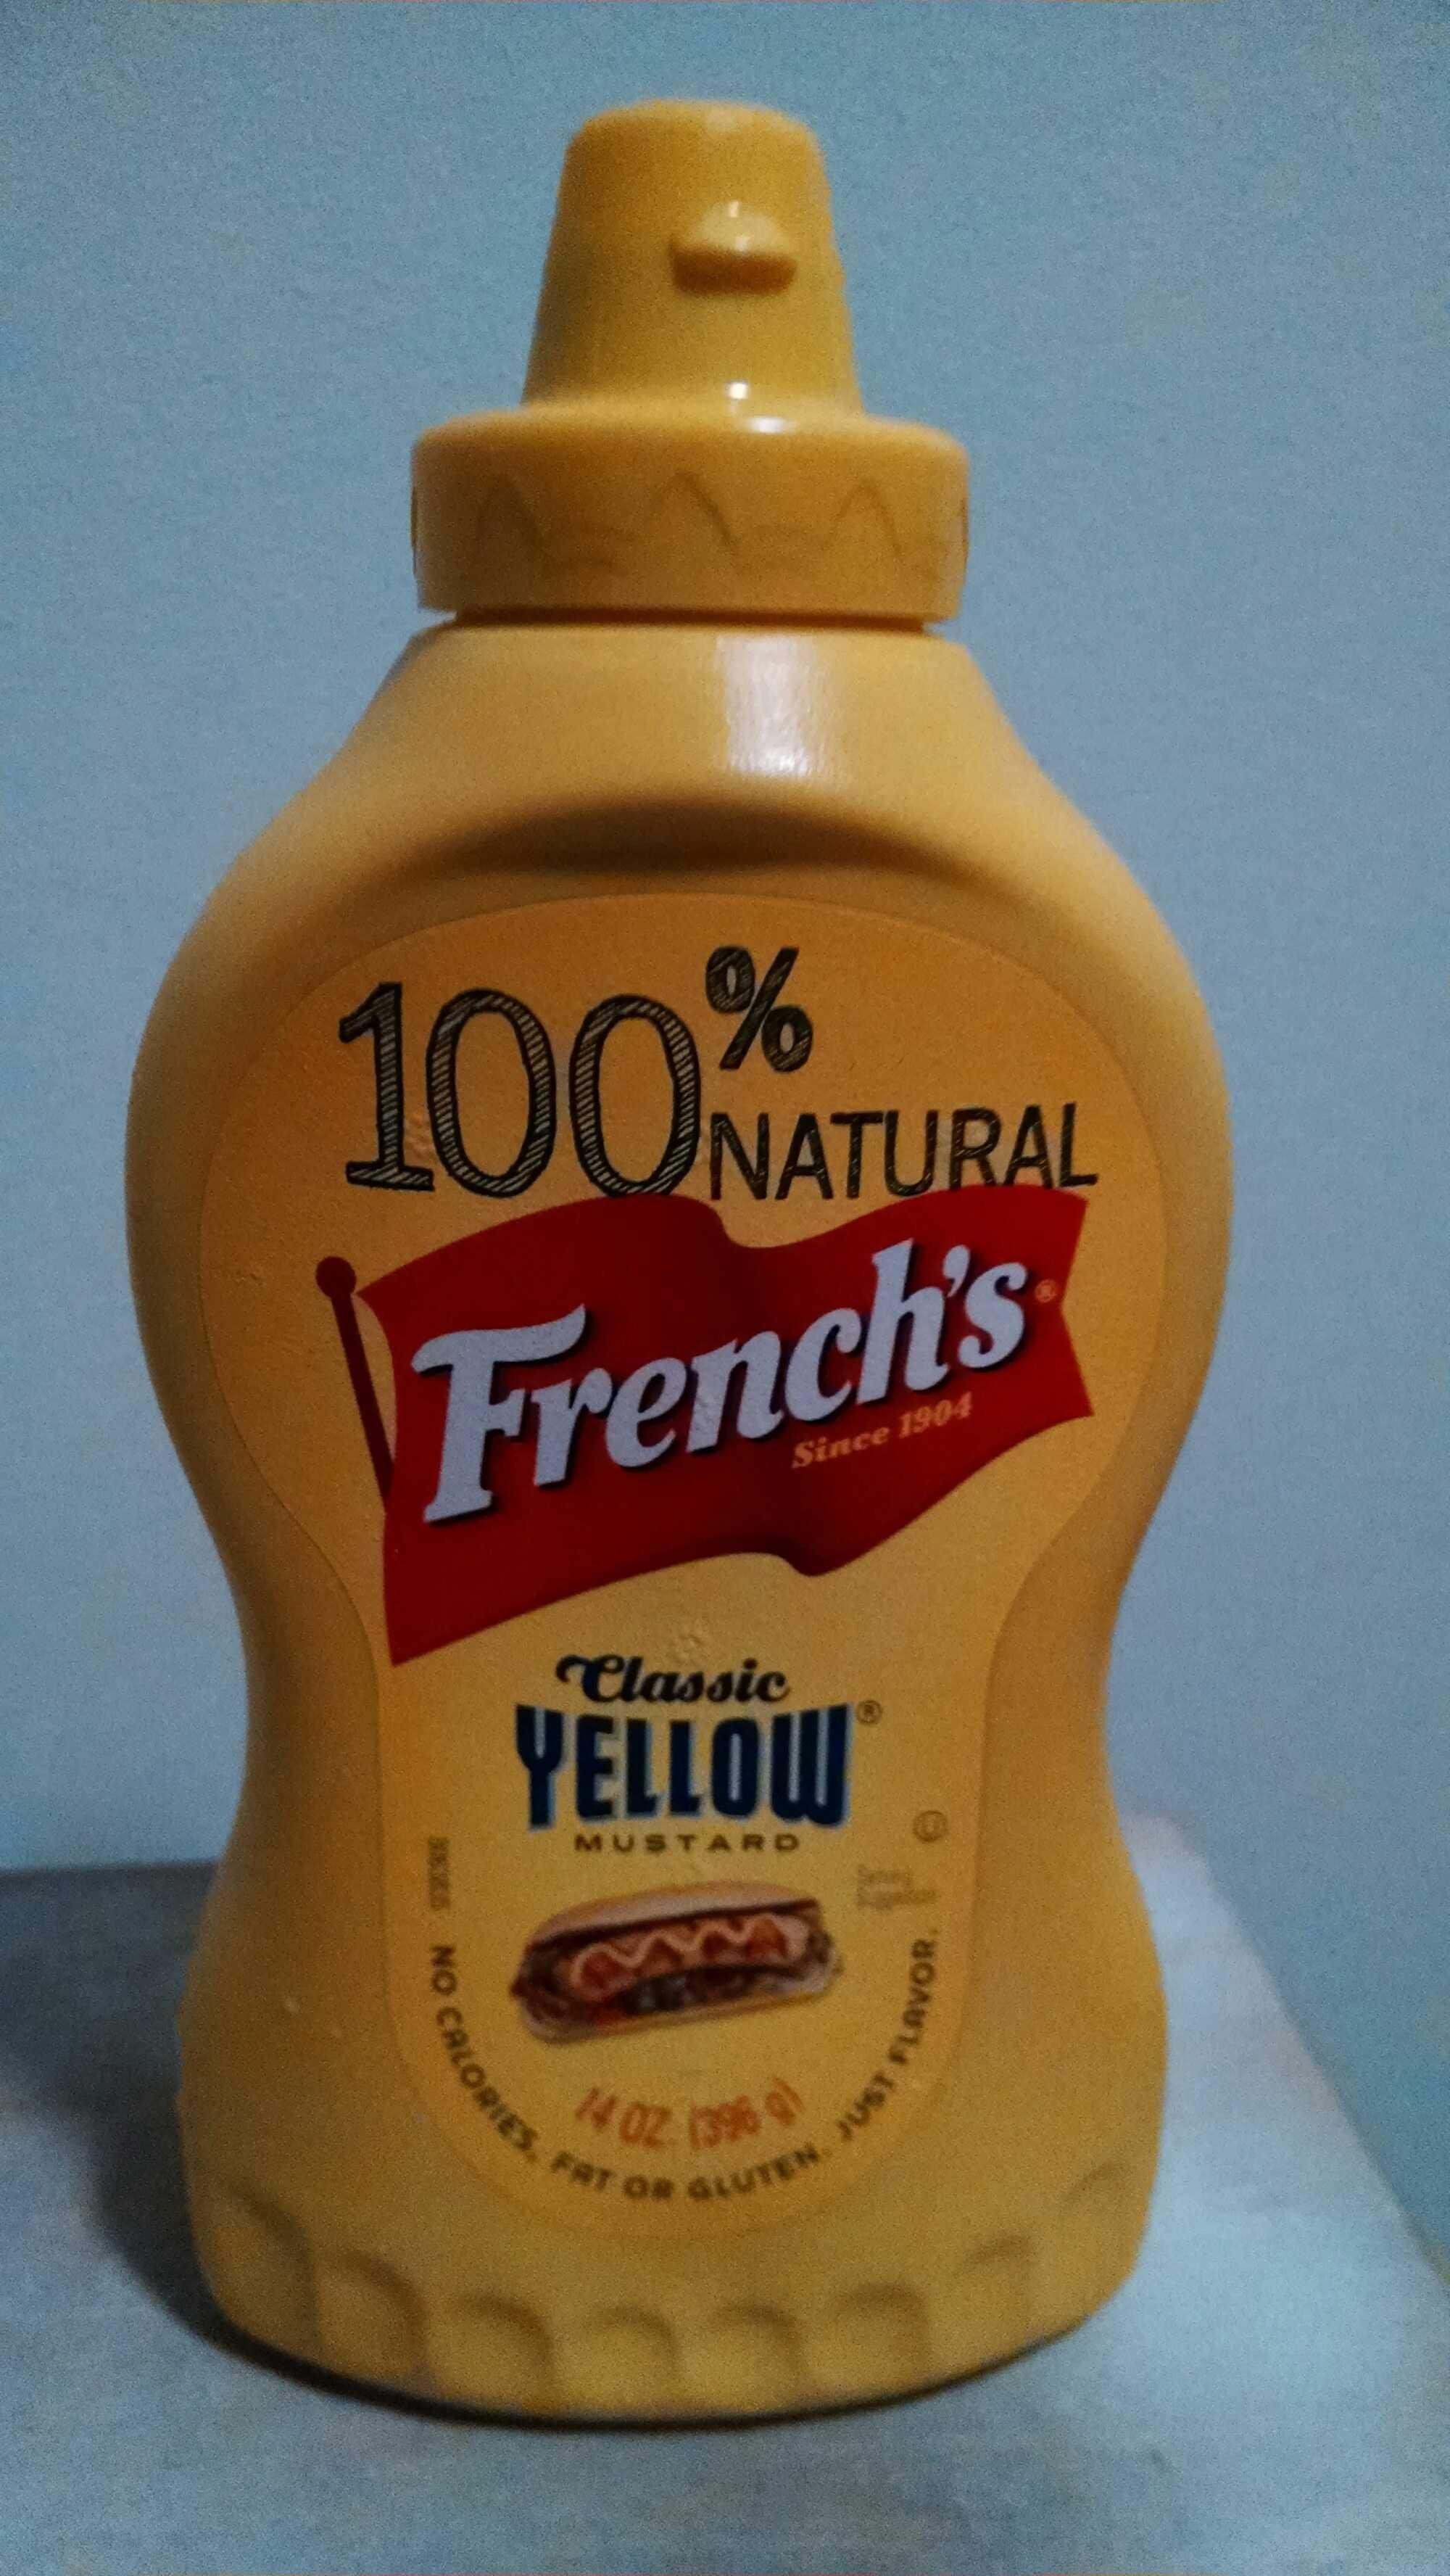 Classic Yellow Mustard - Product - en